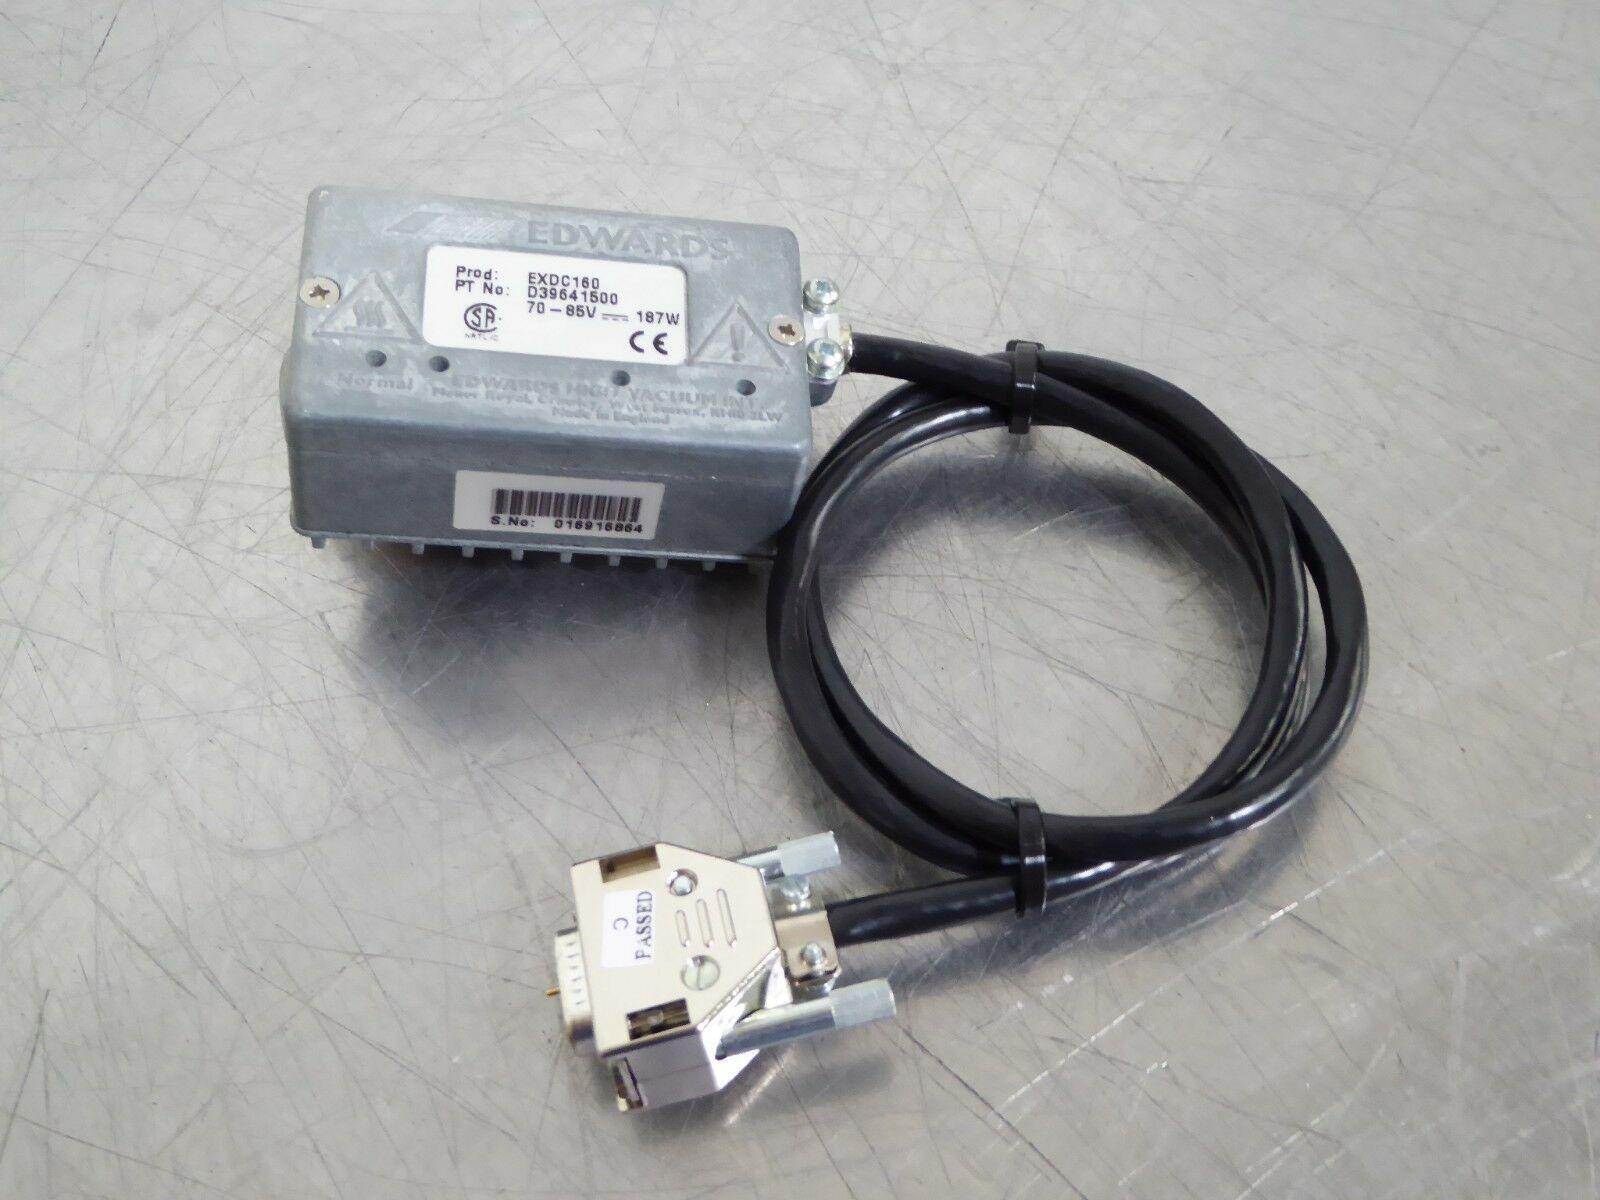 TB Edwards EXDC160 (187W) Turbo Pump Controller D3